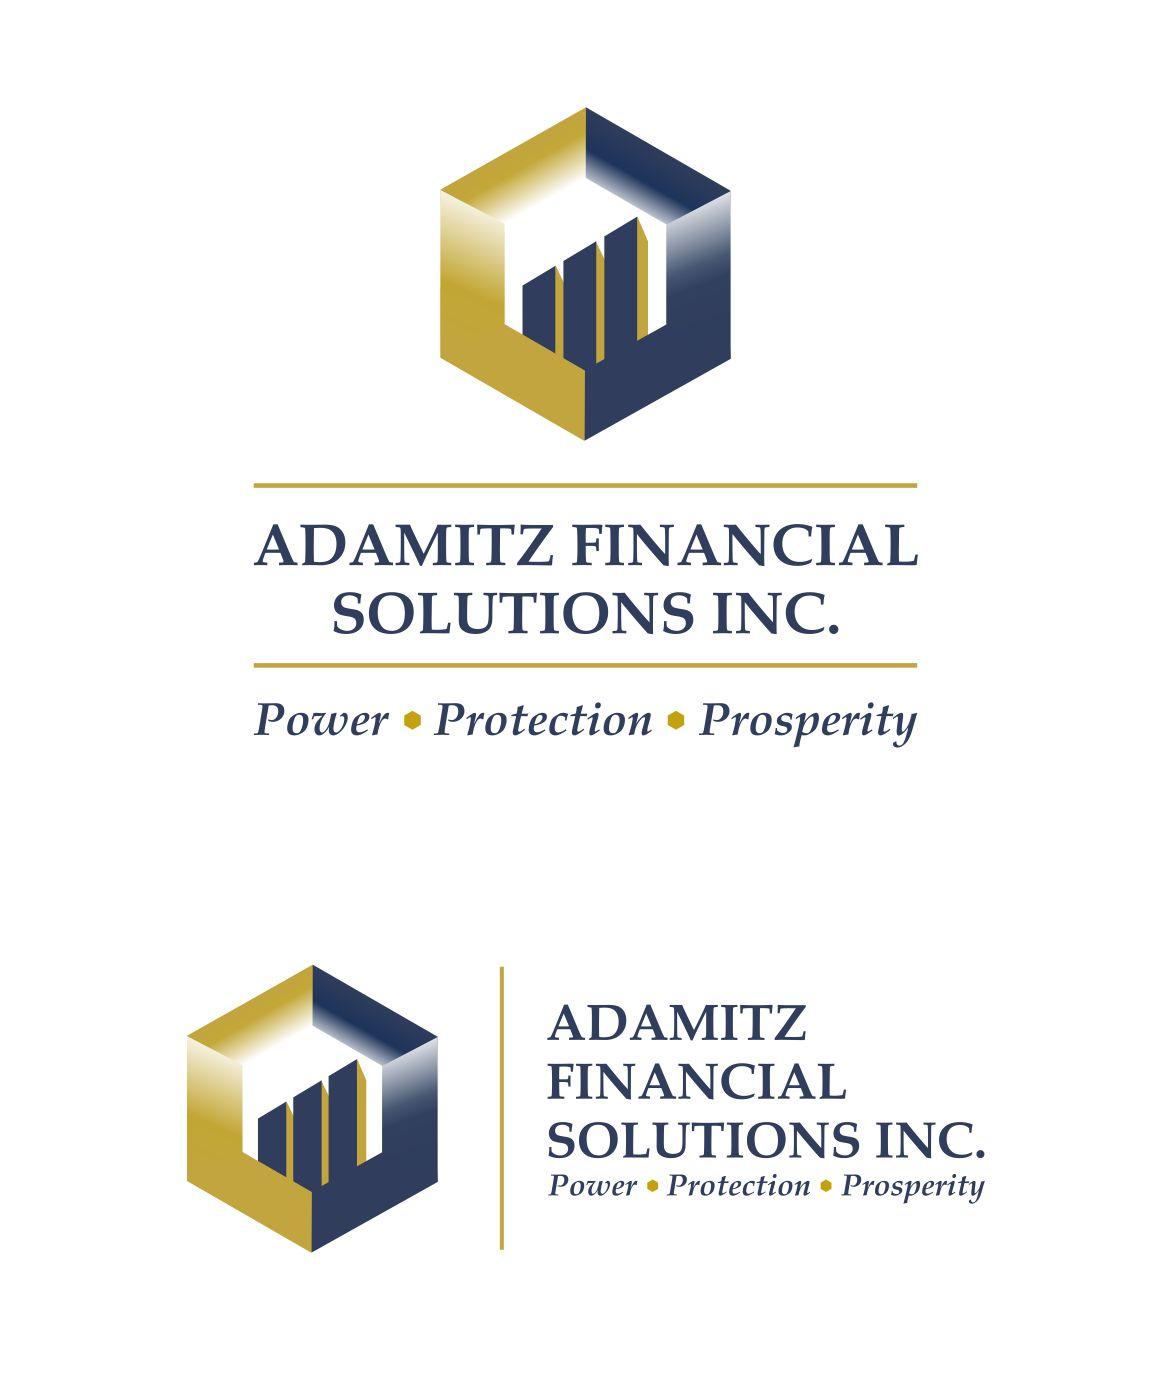 Adamitz Financial Solutions Inc. Logo.jpg